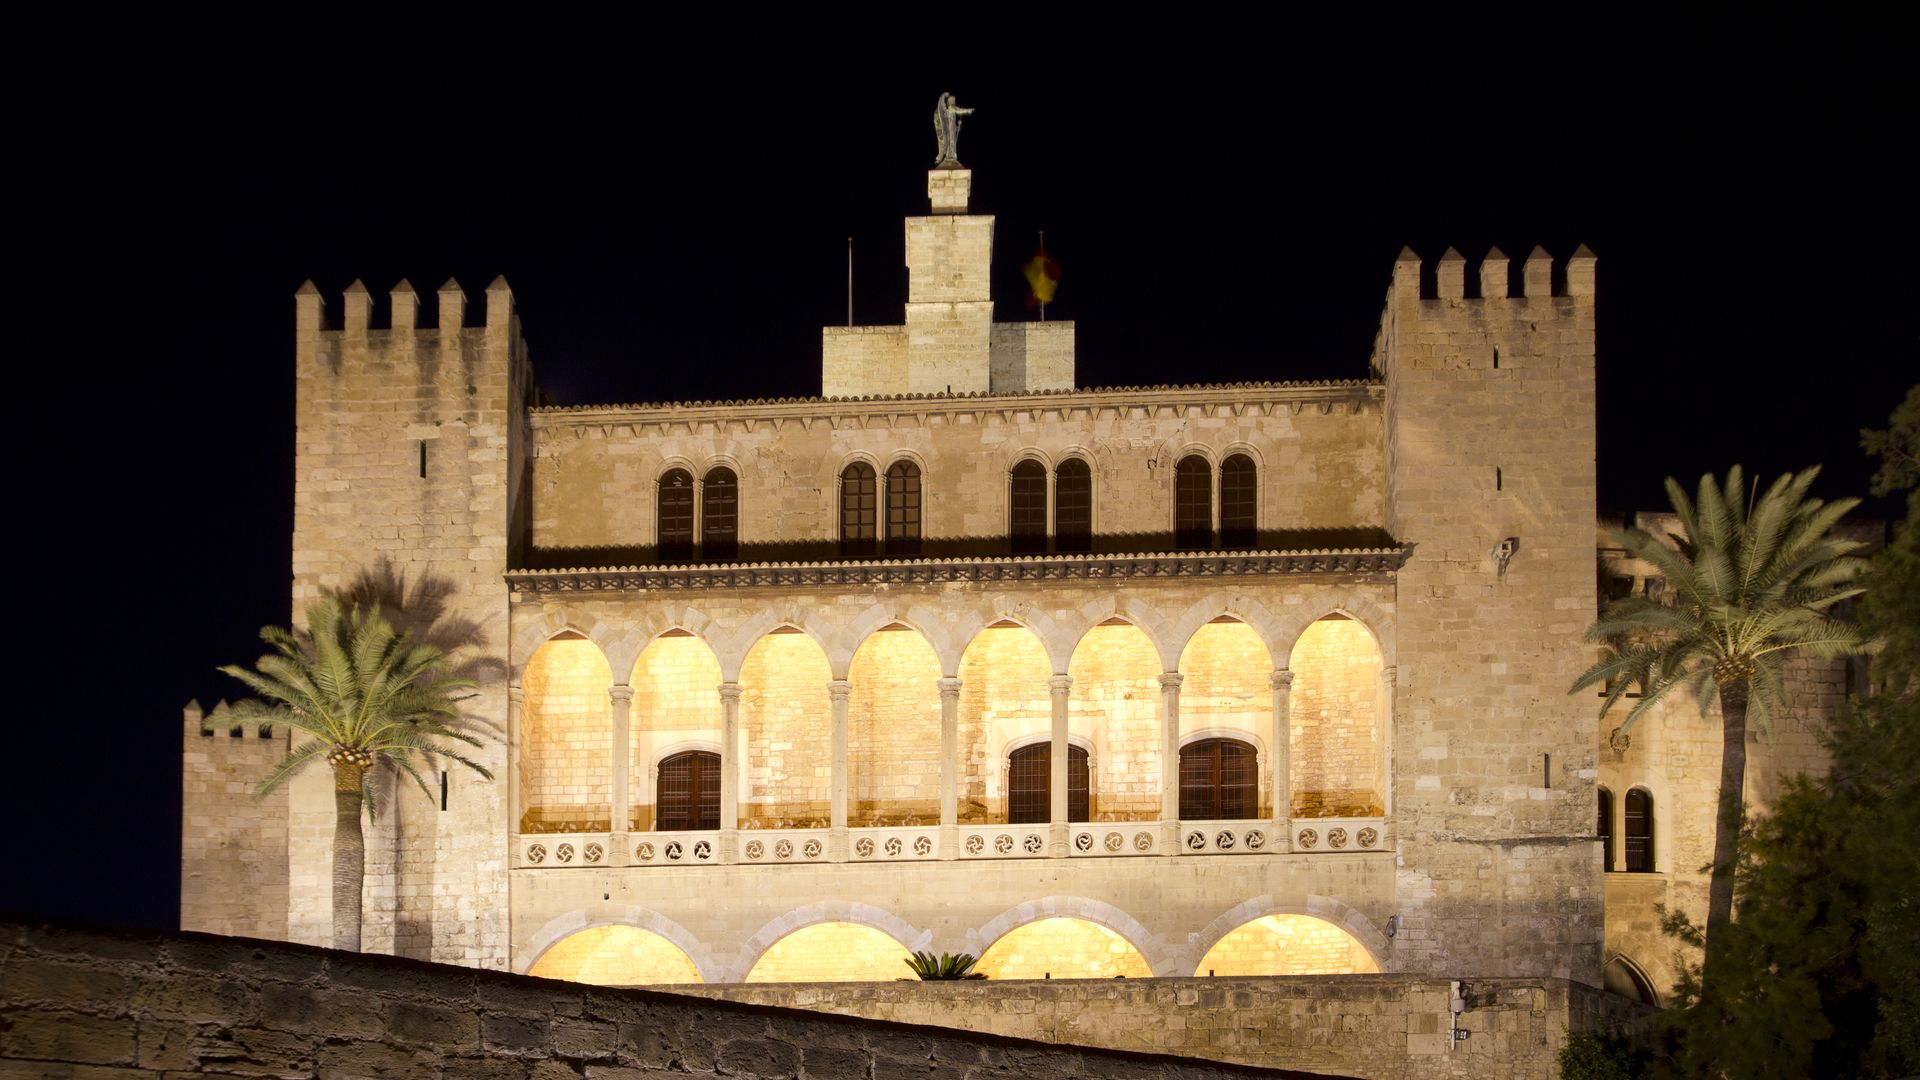 Imagen Venue Palau Reial de l'Almudaina